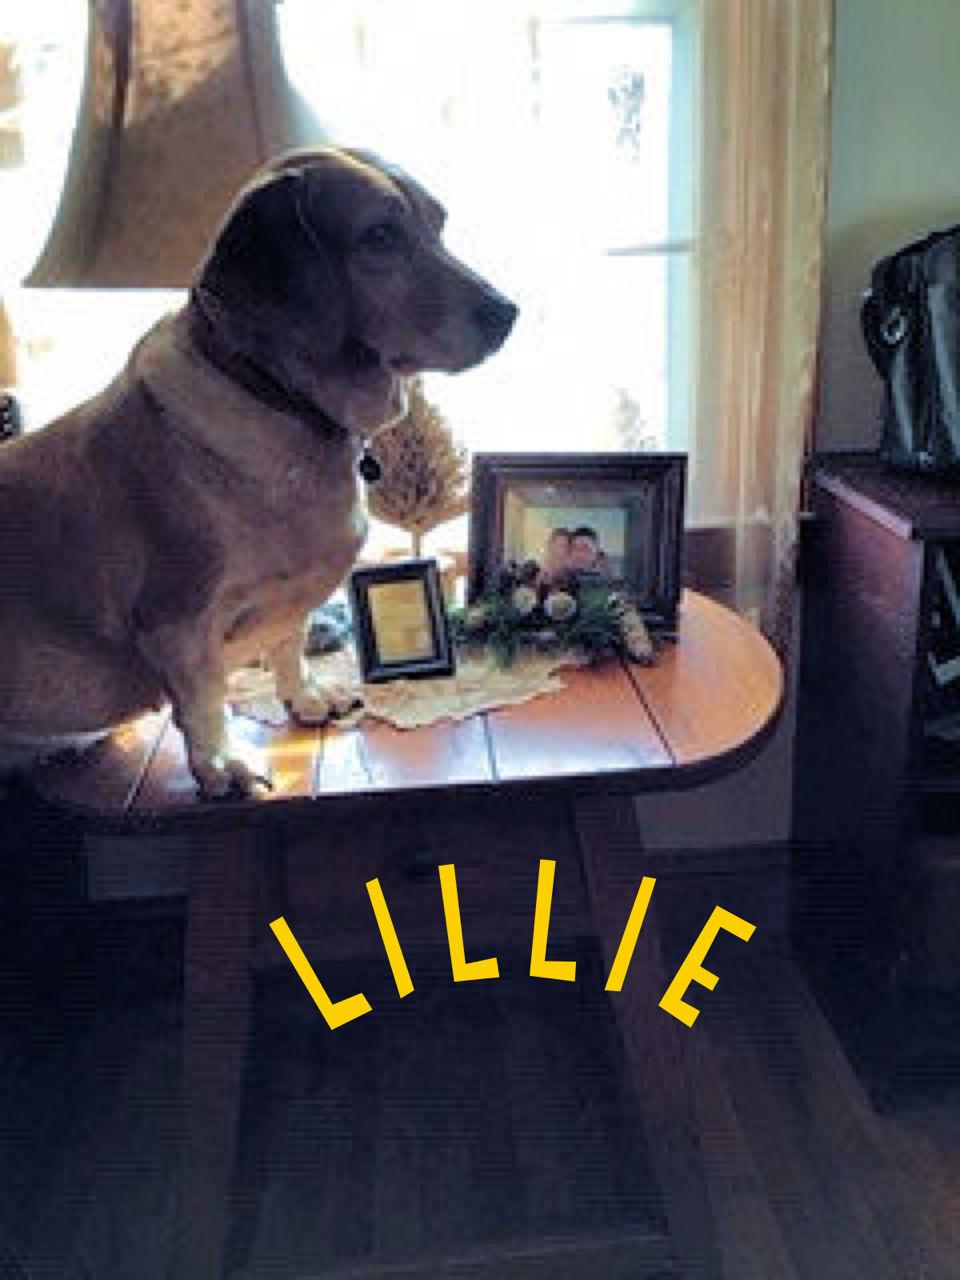 Lillie the dog